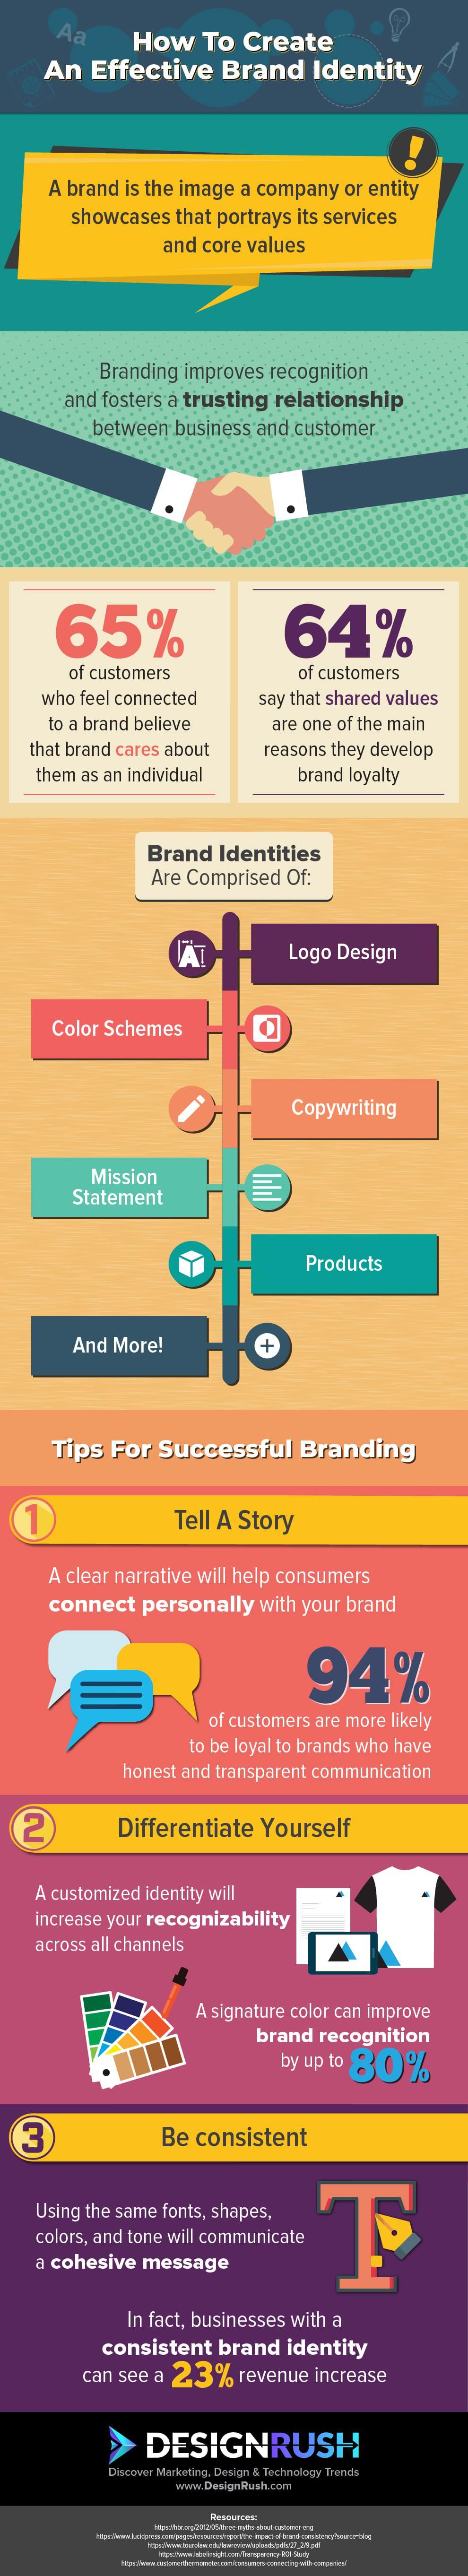 DesignRush_BrandIdentity_Infographic